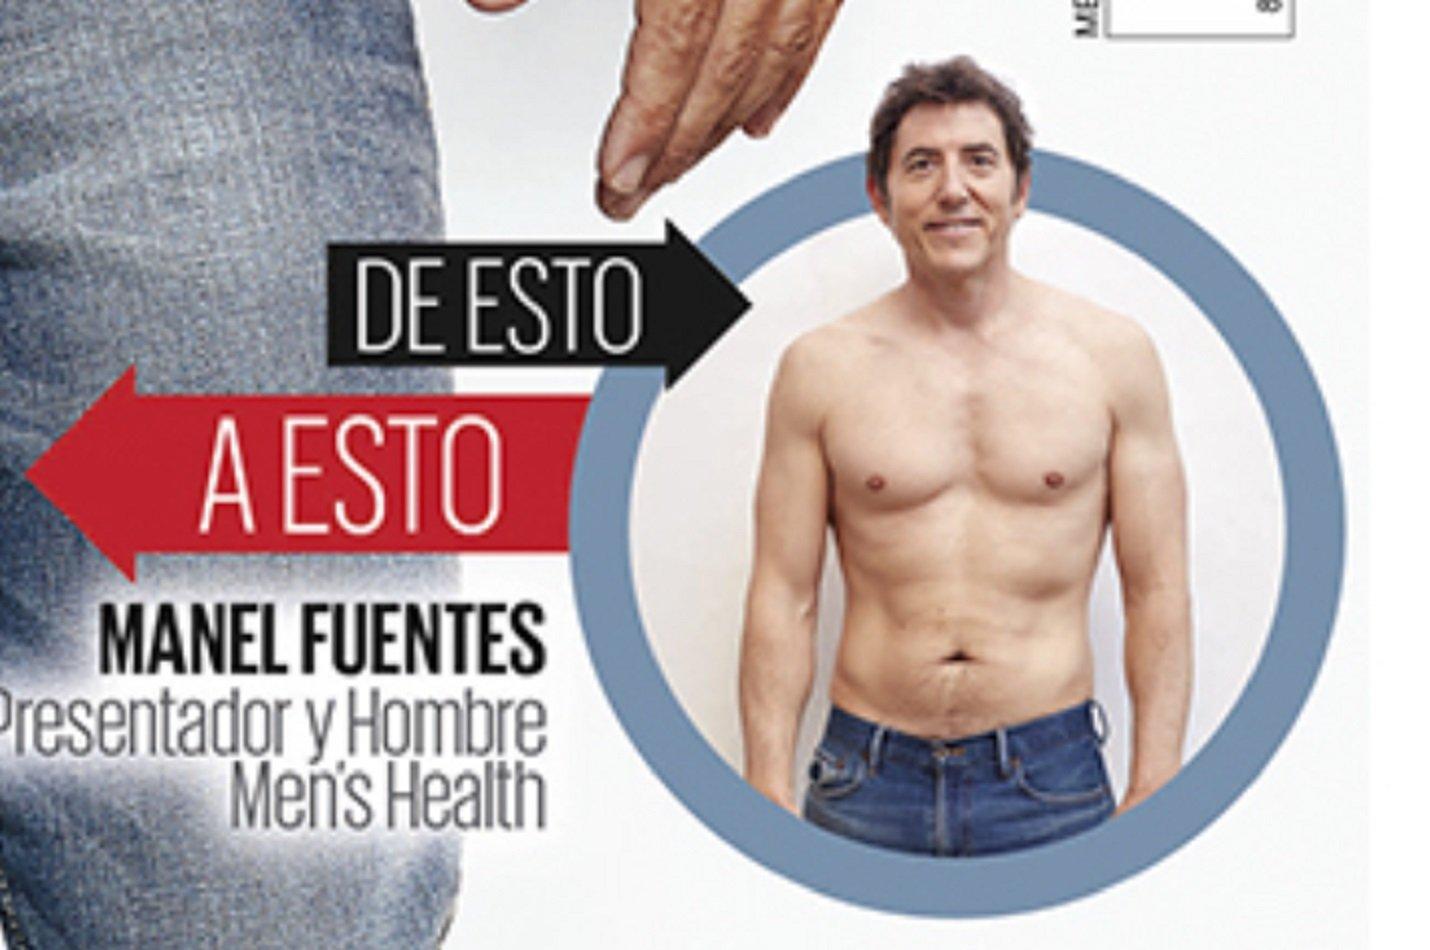 manel fuentes canvi fisic 2 men's health